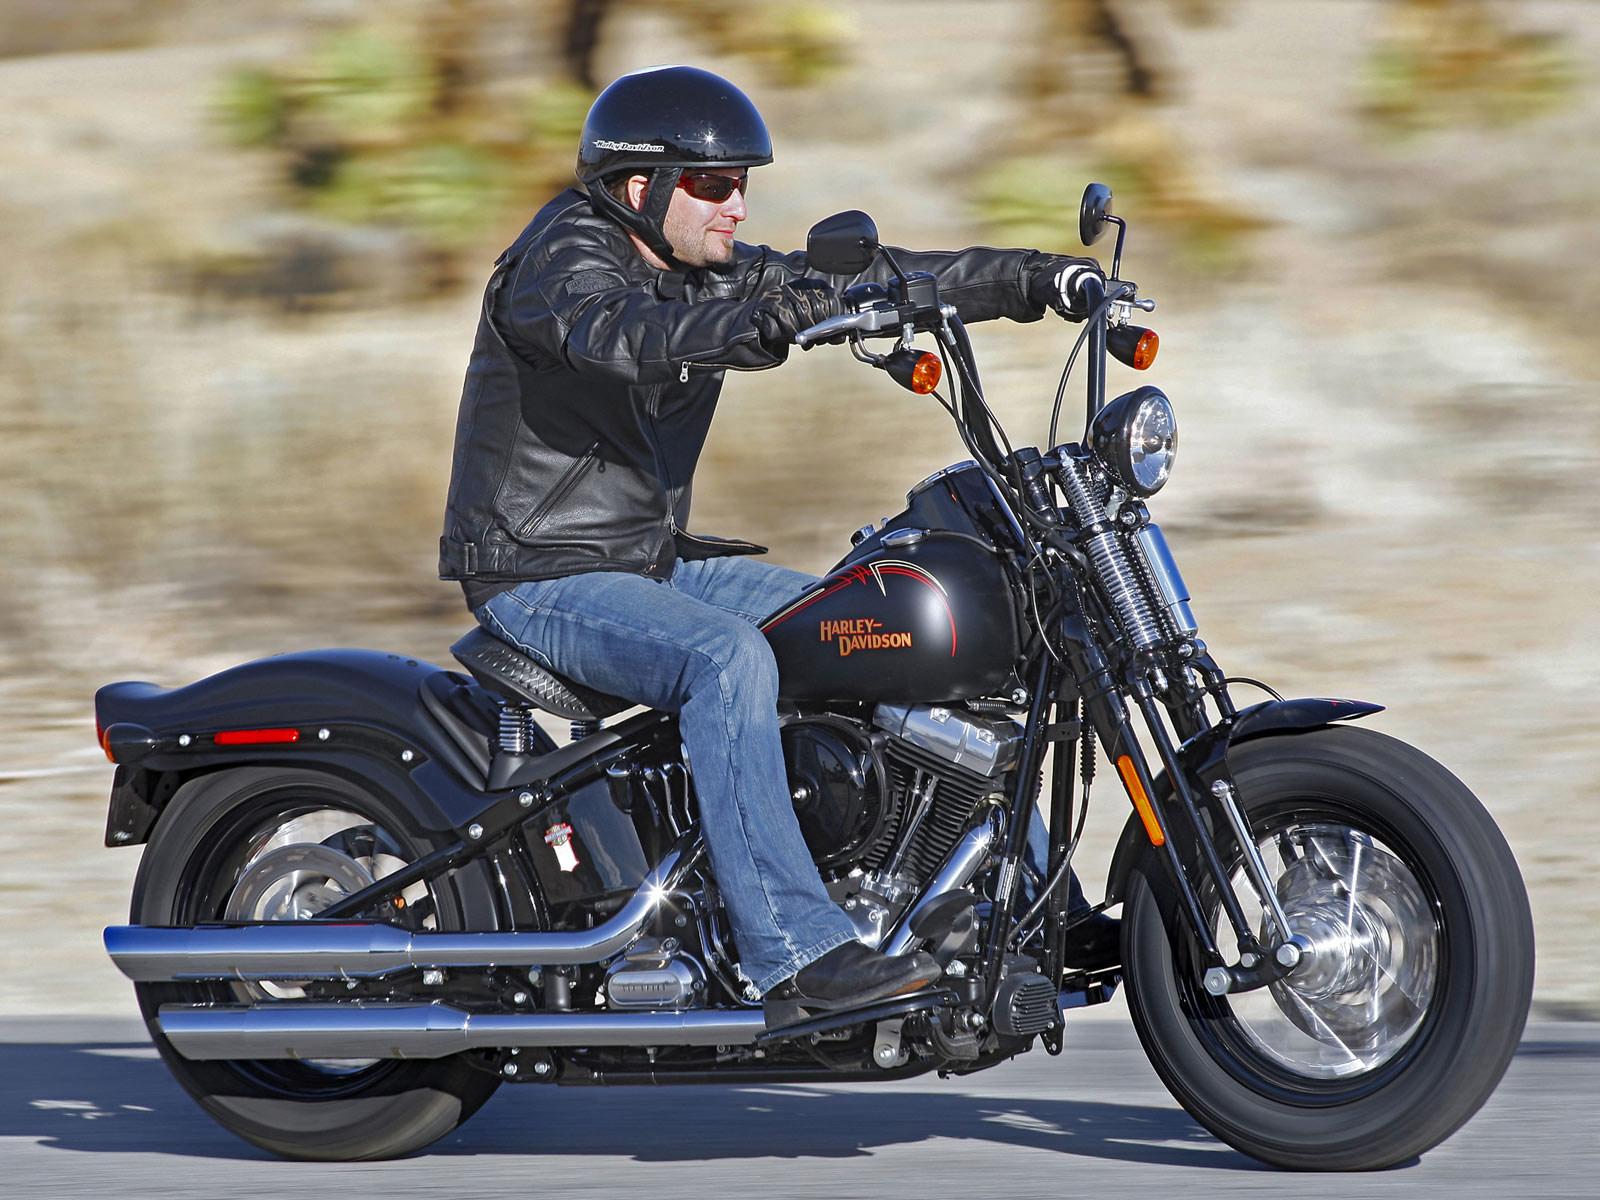 Harley-Davidson Bronx will not launch next year - Autocar